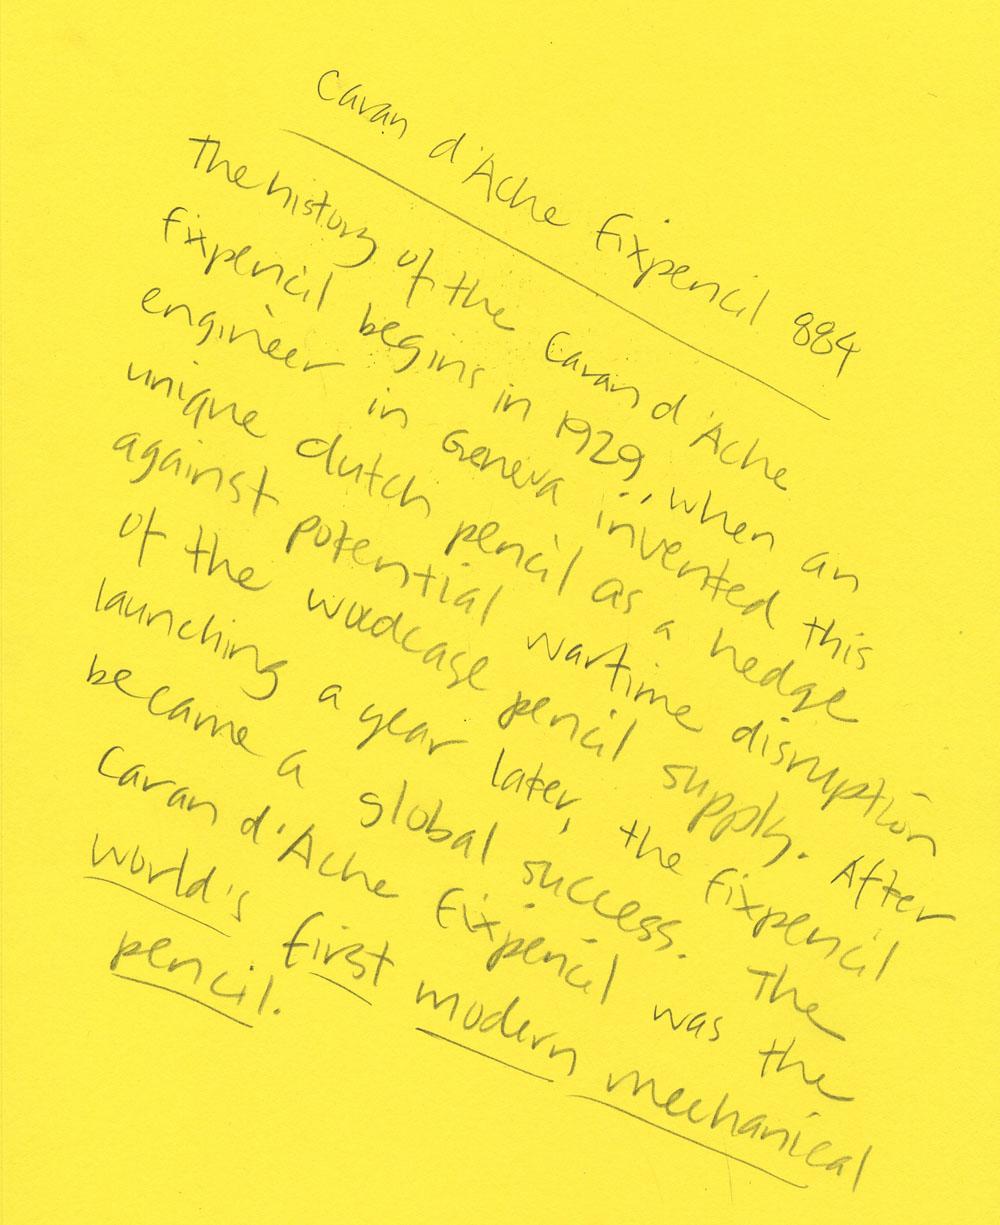 5 - Fixpencil writing sample